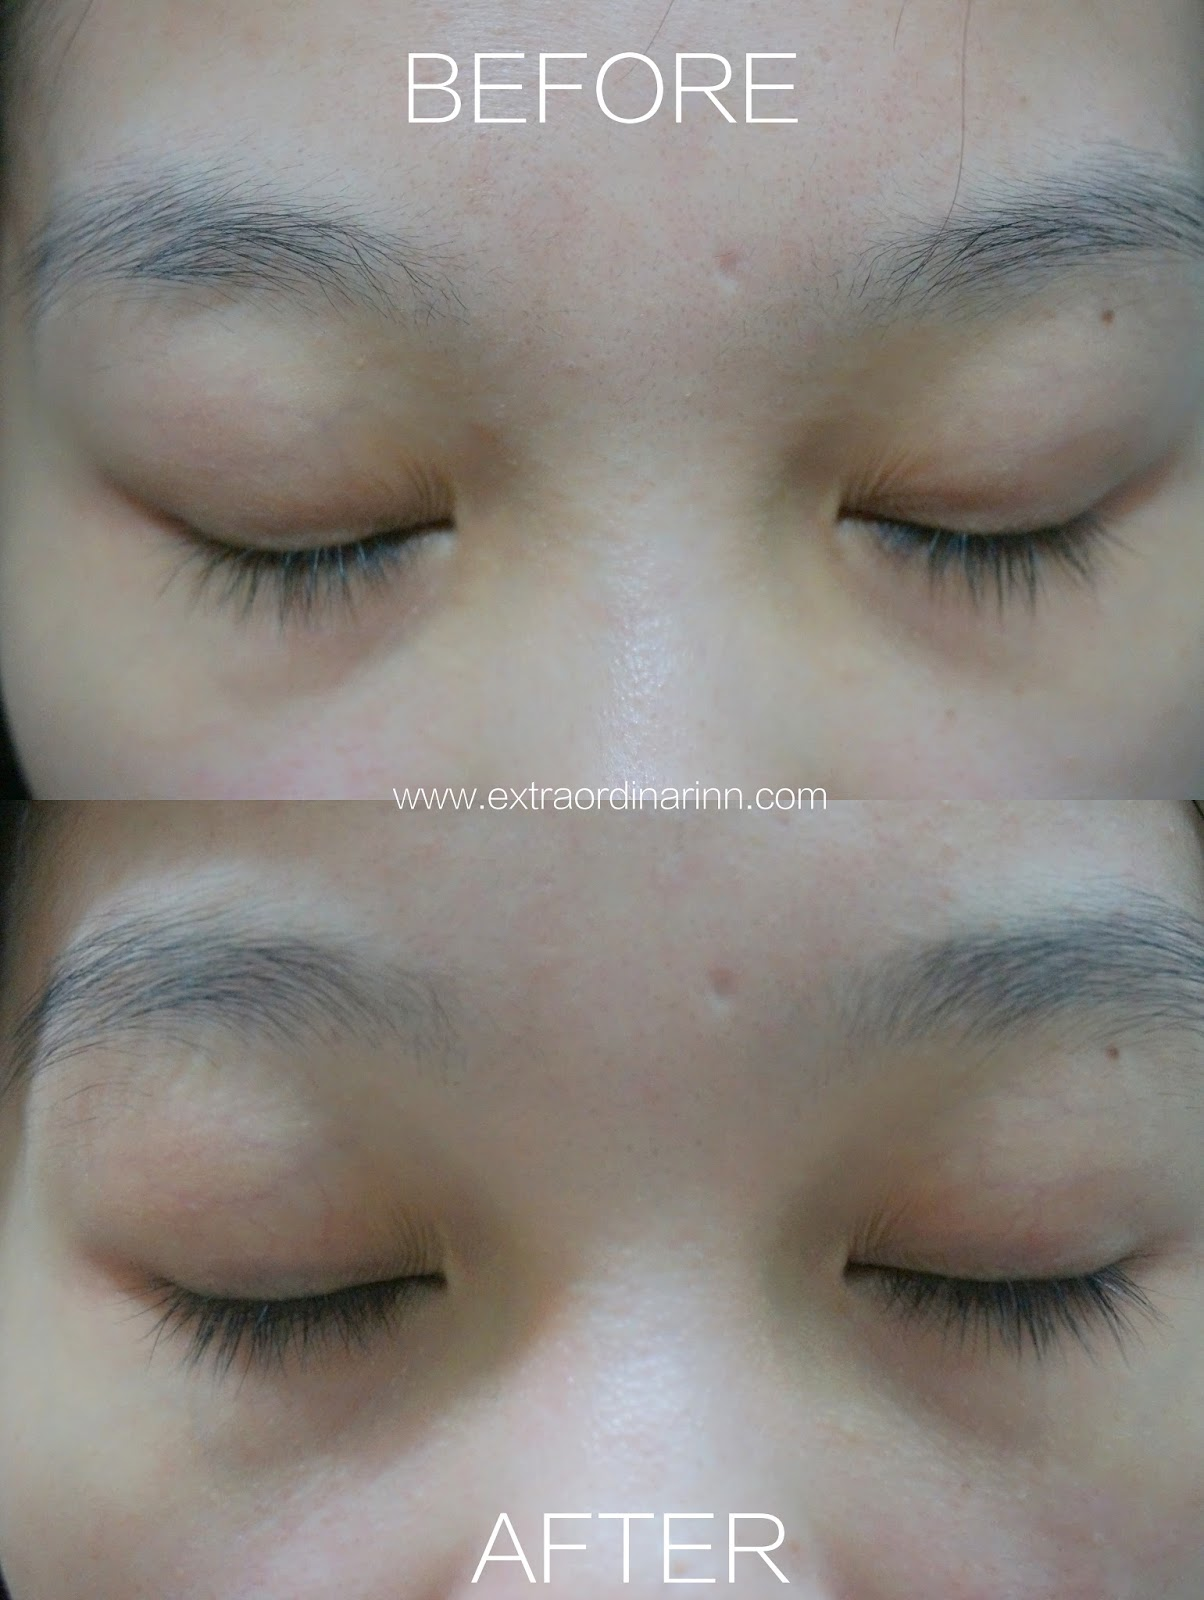 Carinn Carerynn Malaysia Fashion Beauty Lifestyle Blog Beauty